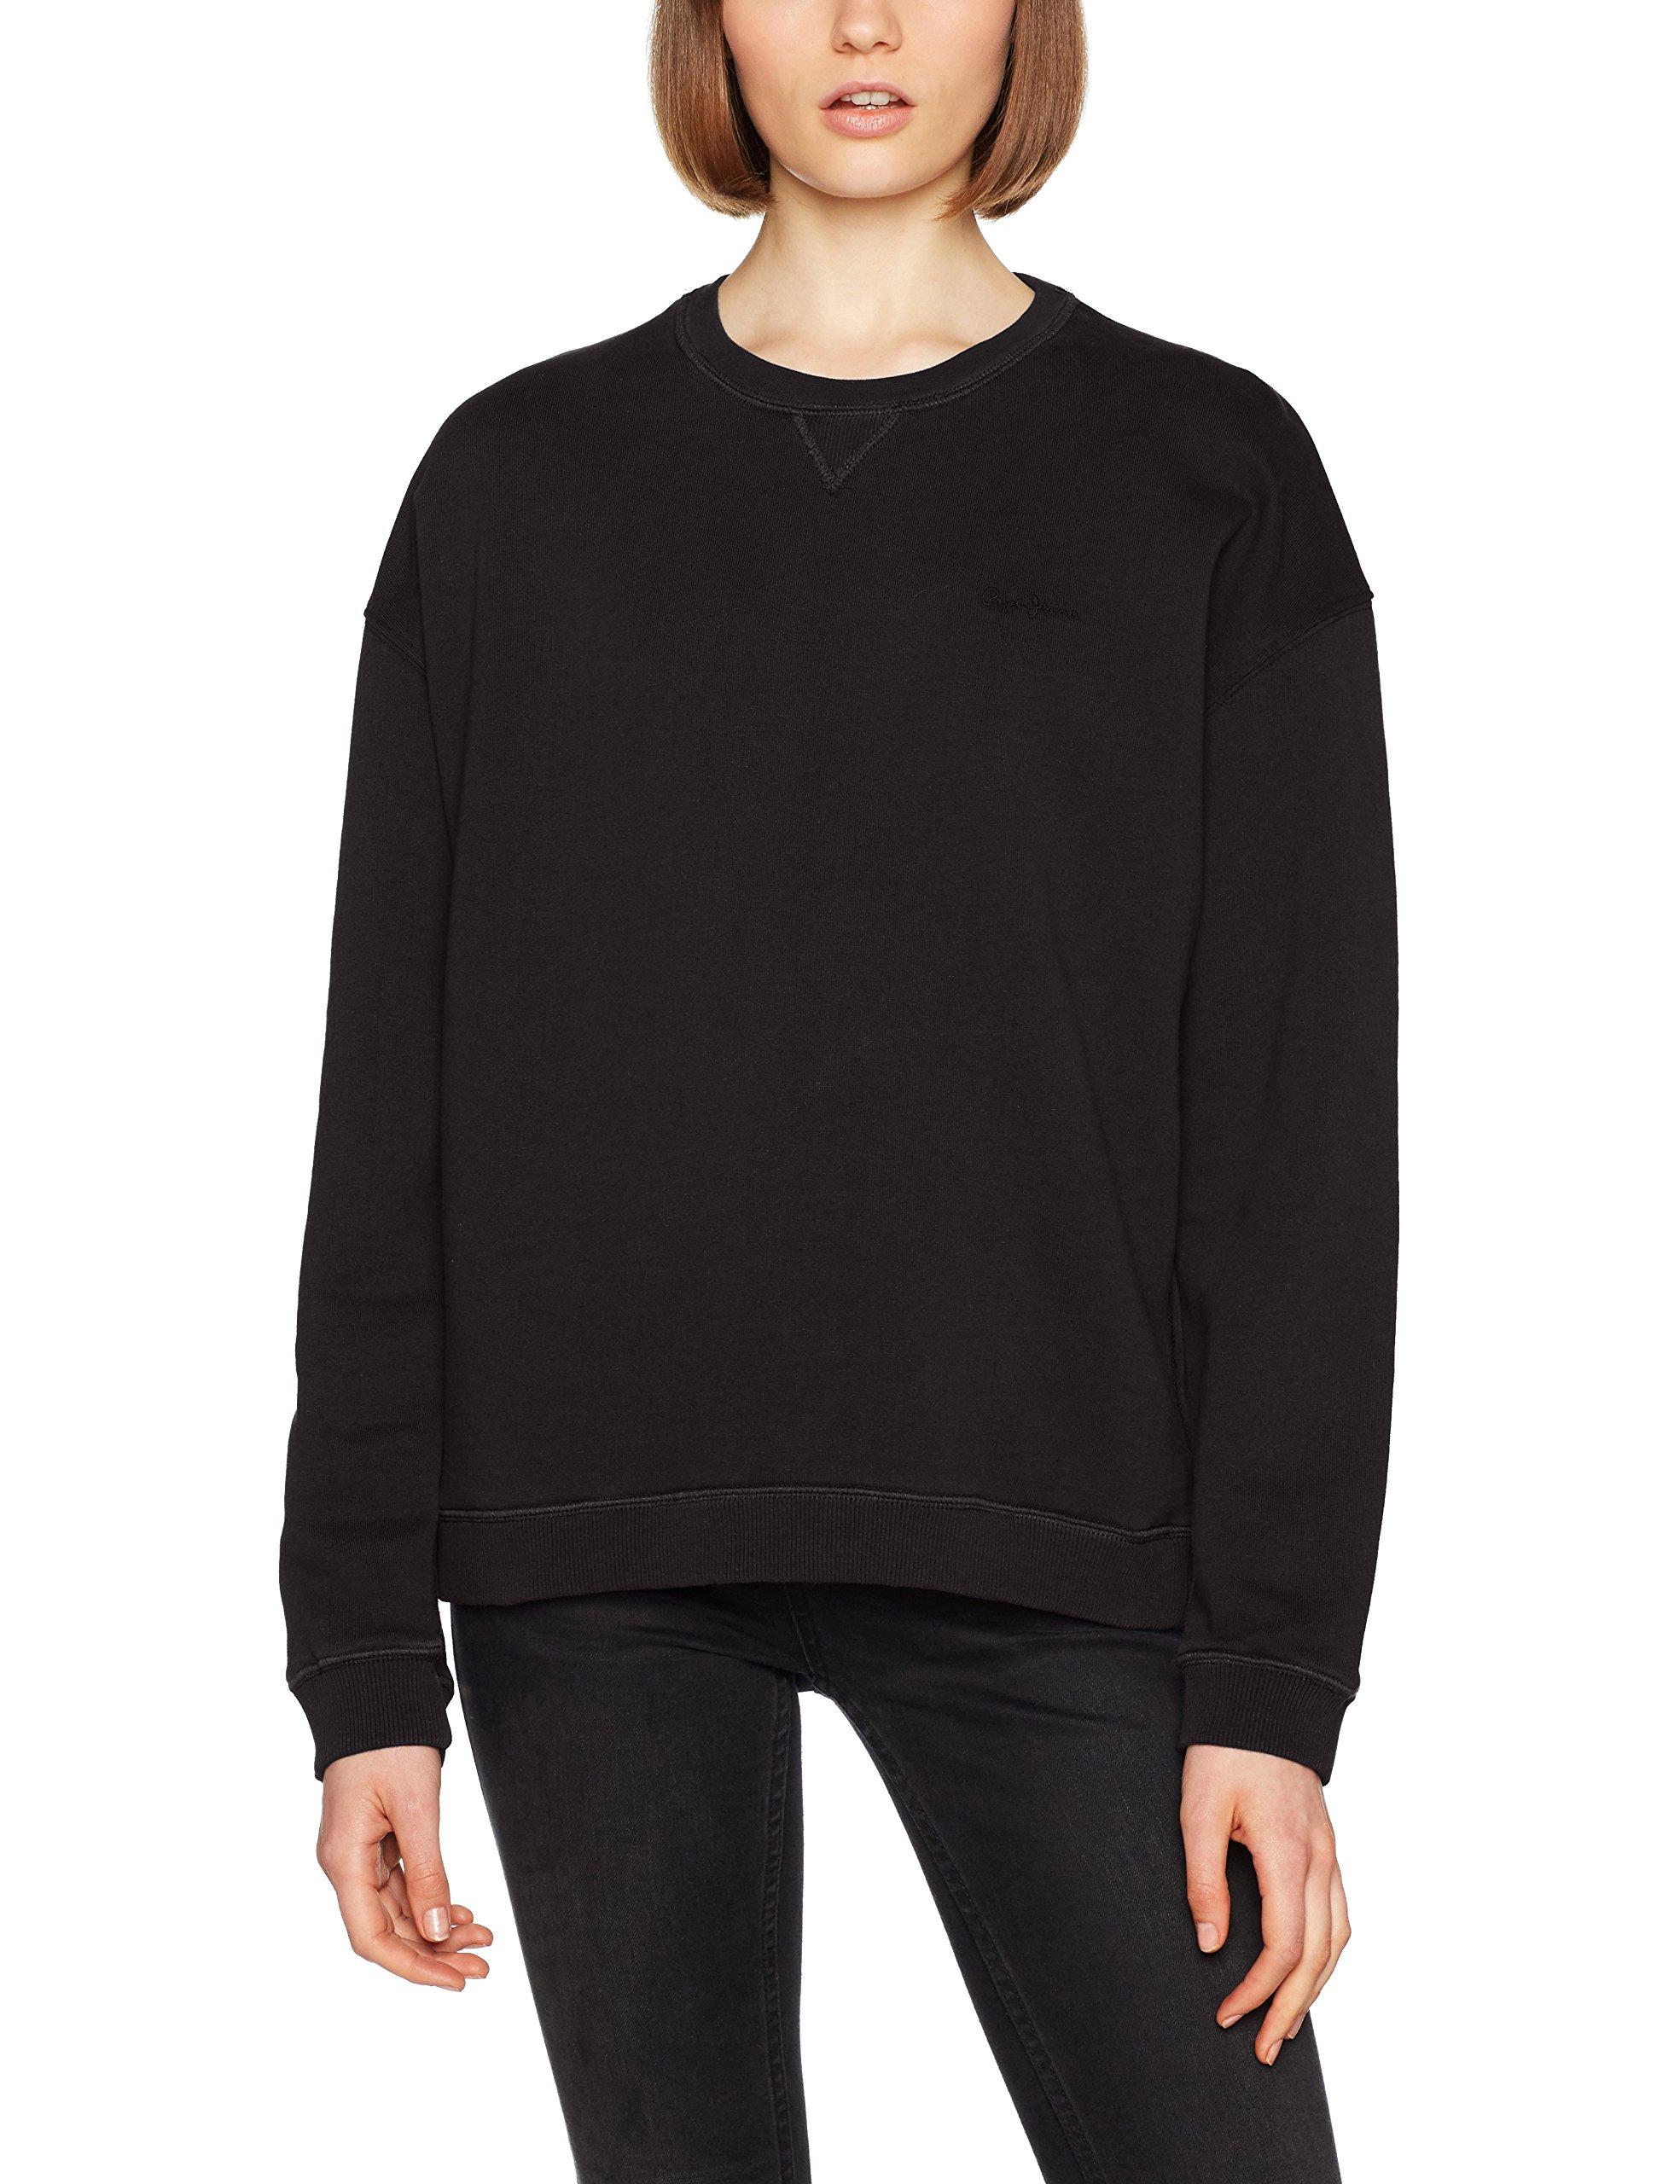 Jeans Pepe Femme xxs Neck Ladies NoirblackXx smalltaille Crew Fabricant shirt Sweat uFKc3TlJ51